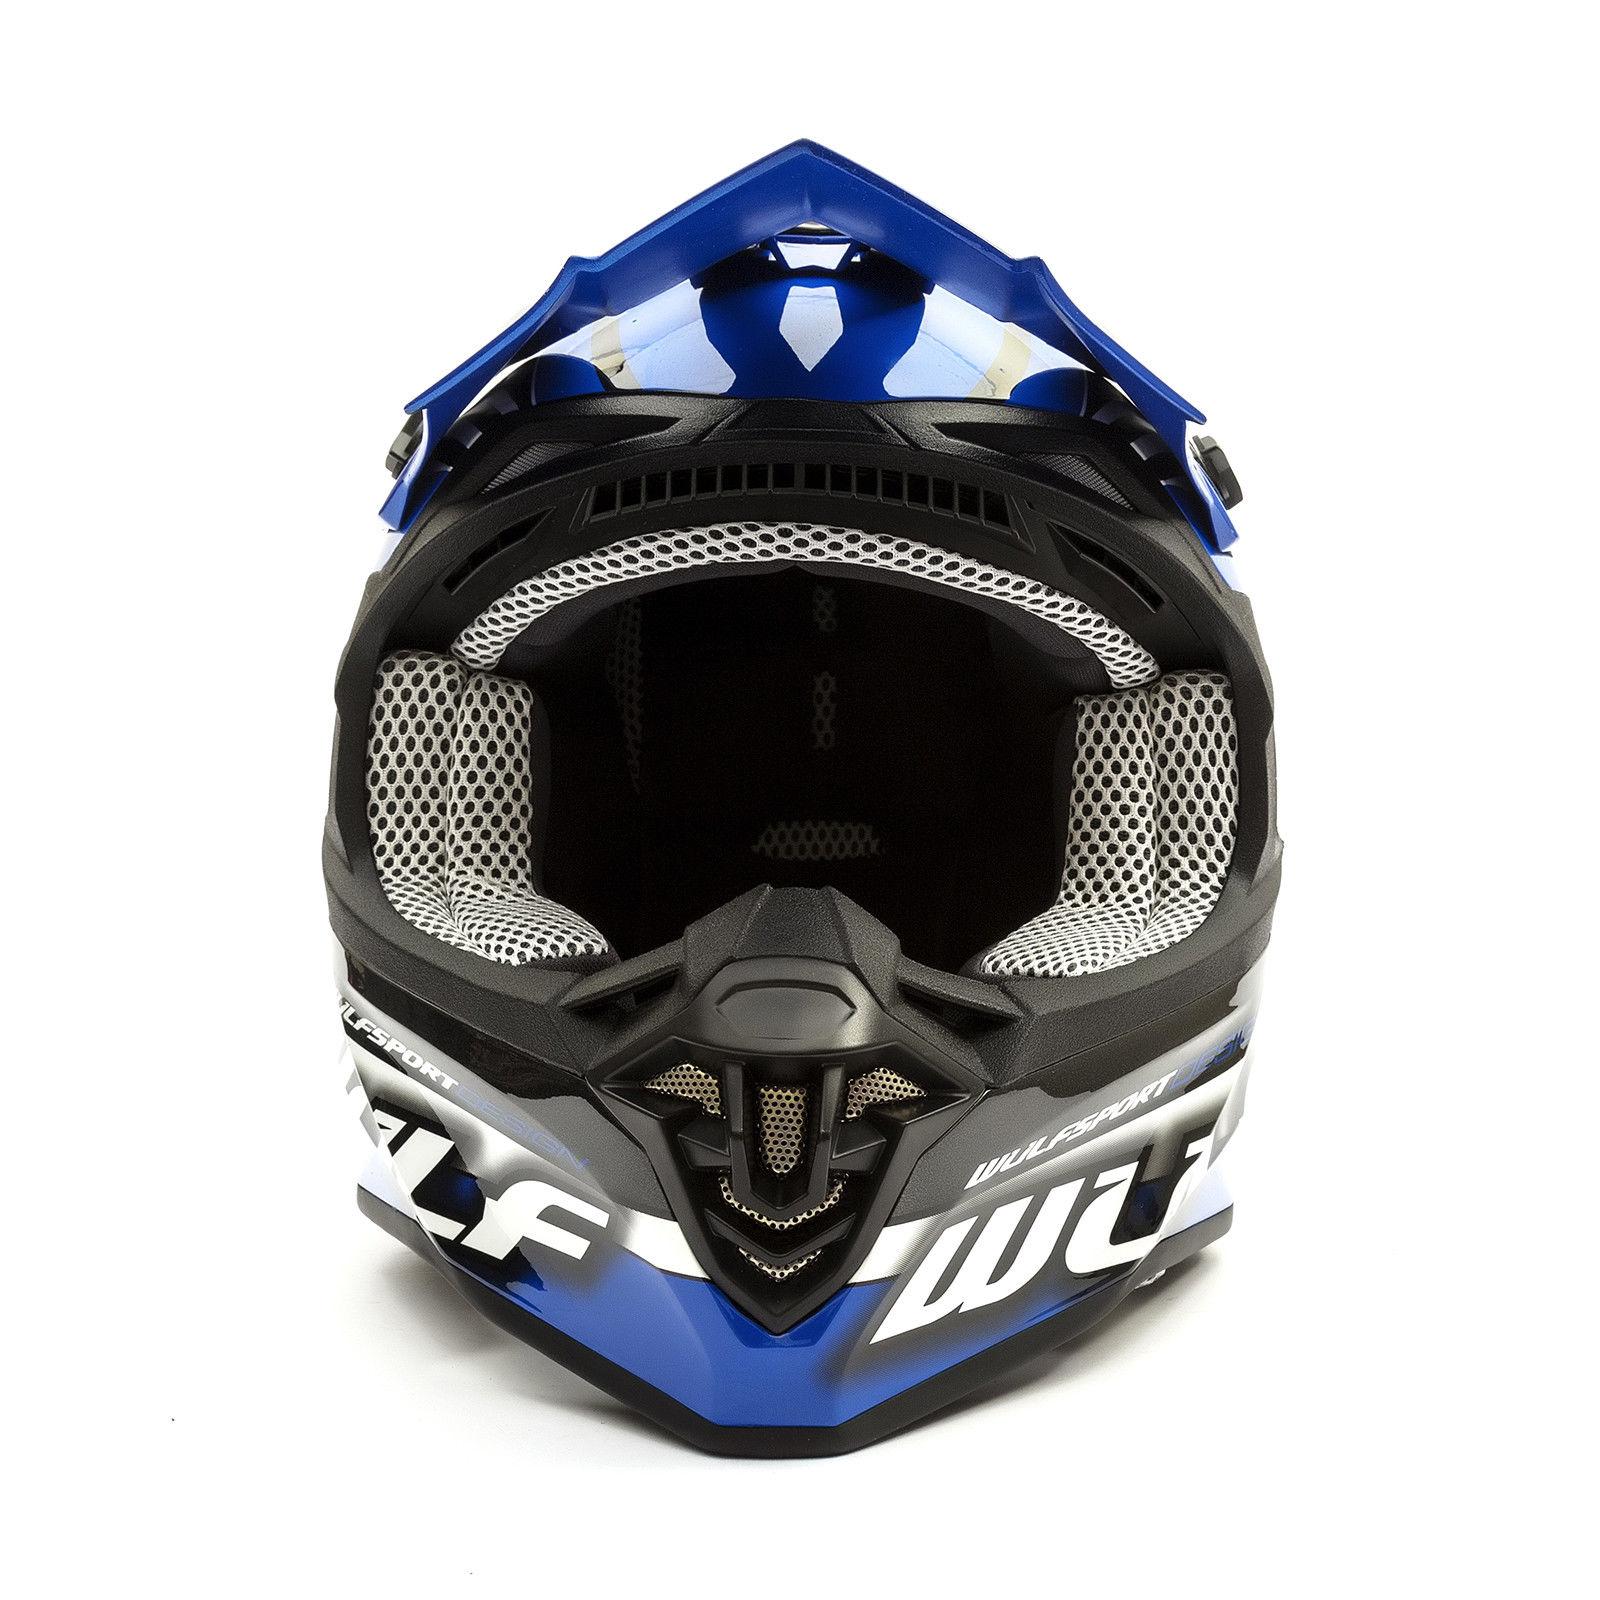 Wulfsport-Adult-Sceptre-Helmets-Motocross-Pitbike-Motorbike-Off-Road-Racing-ATV thumbnail 26